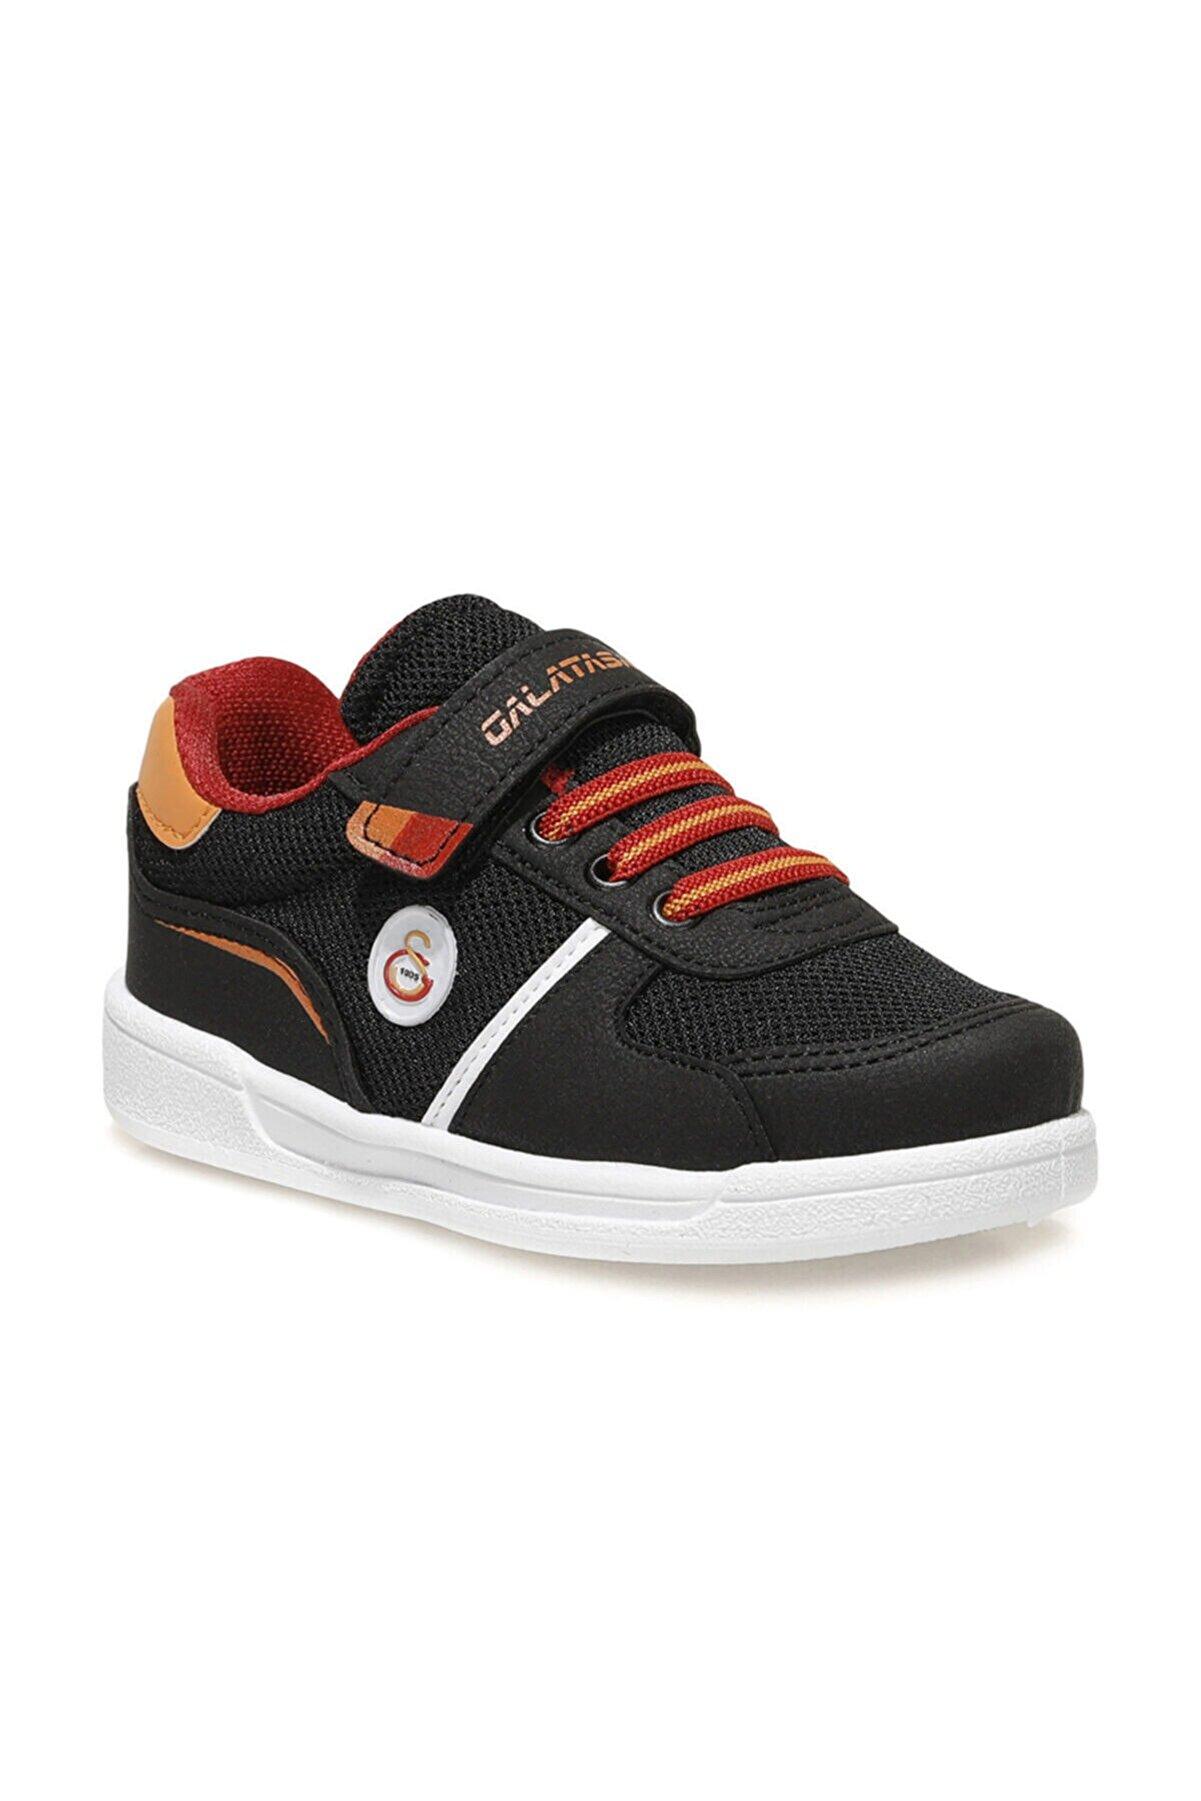 Galatasaray KREJA GS 1FX Siyah Erkek Çocuk Sneaker Ayakkabı 101013814